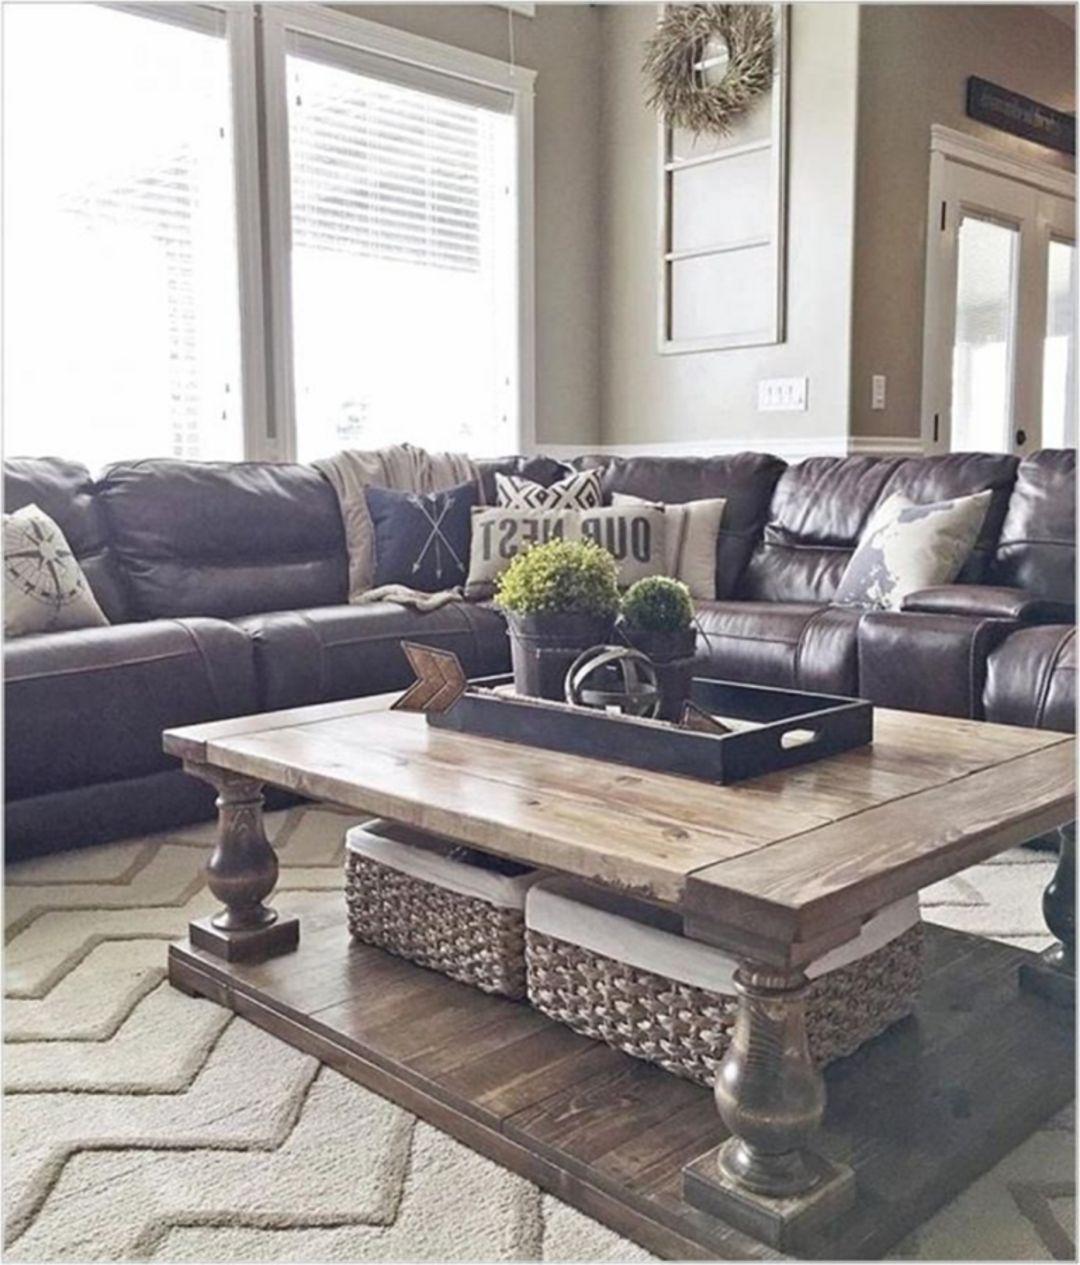 25 Great Farmhouse Coffee Table Design And Decor Ideas Farm House Living Room Brown Living Room Brown Sofa Living Room